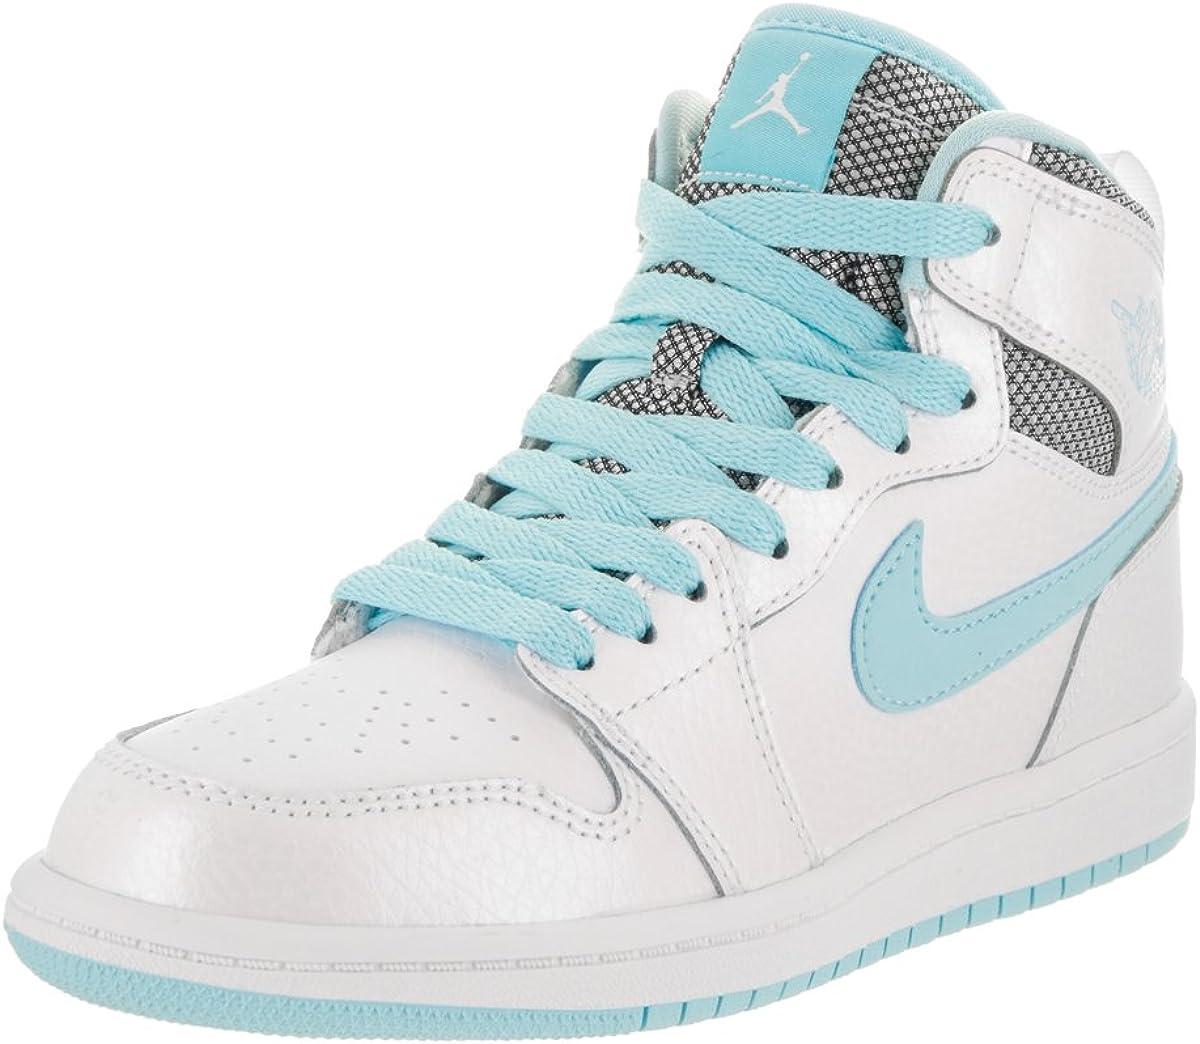 Jordan Nike Kids 1 Retro High GP White